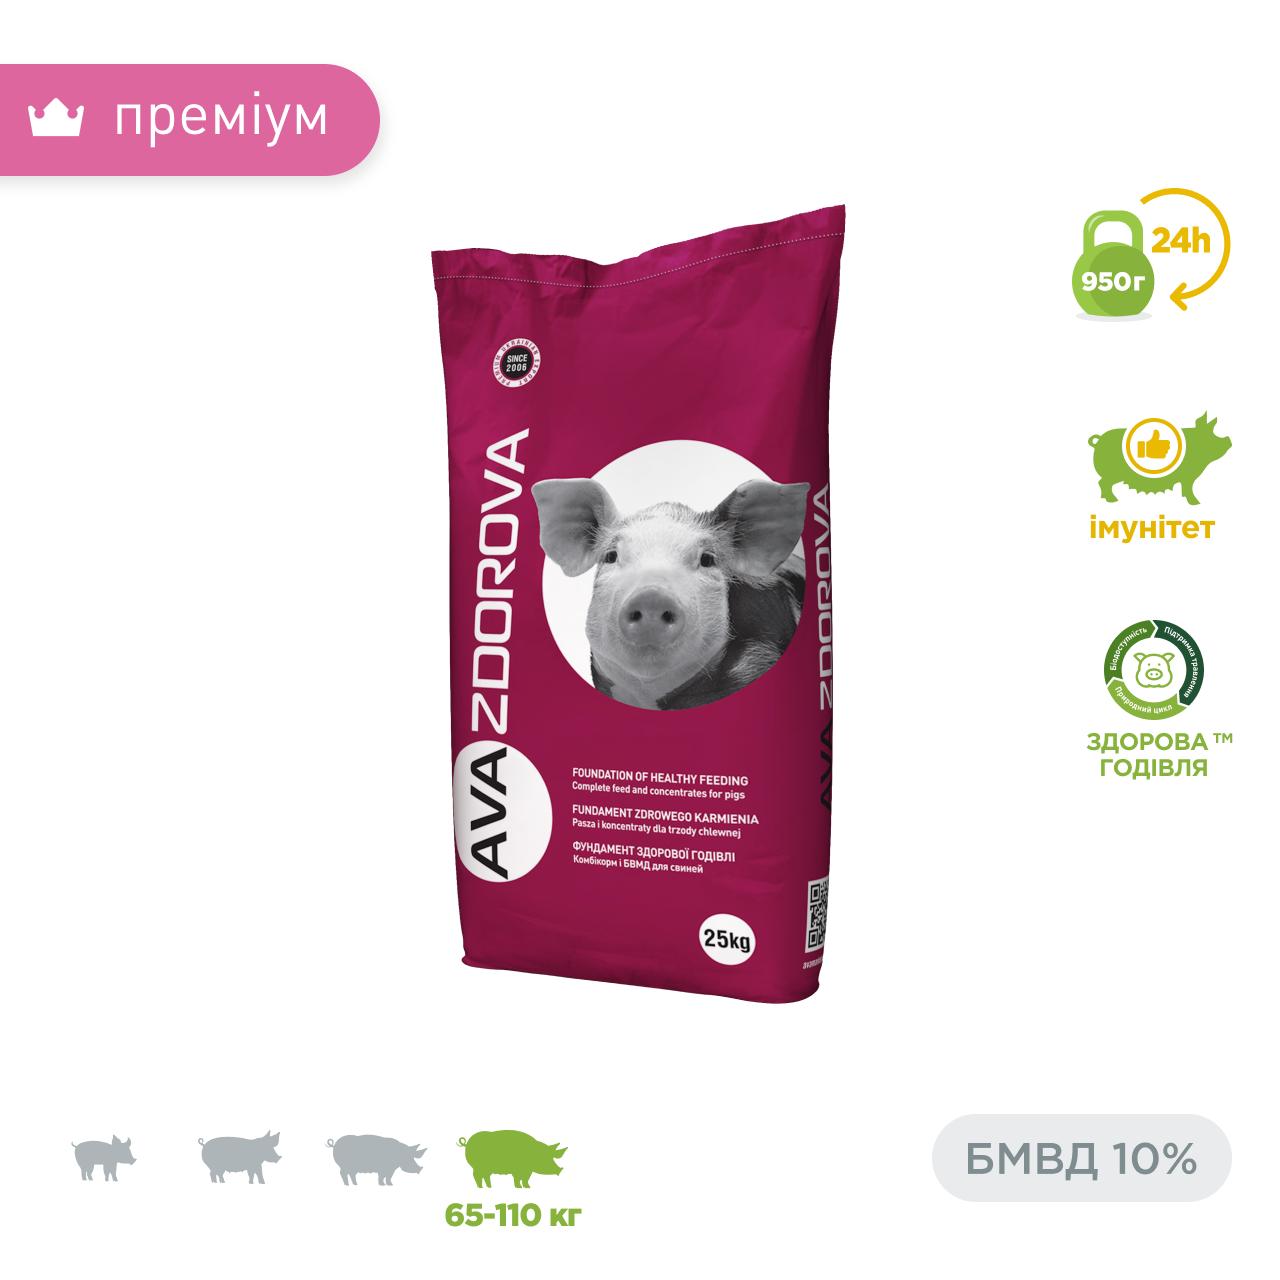 БМВД для свиней добавка от 65 кг AVA ZDOROVA (Здорова) Финиш для свиней 10%